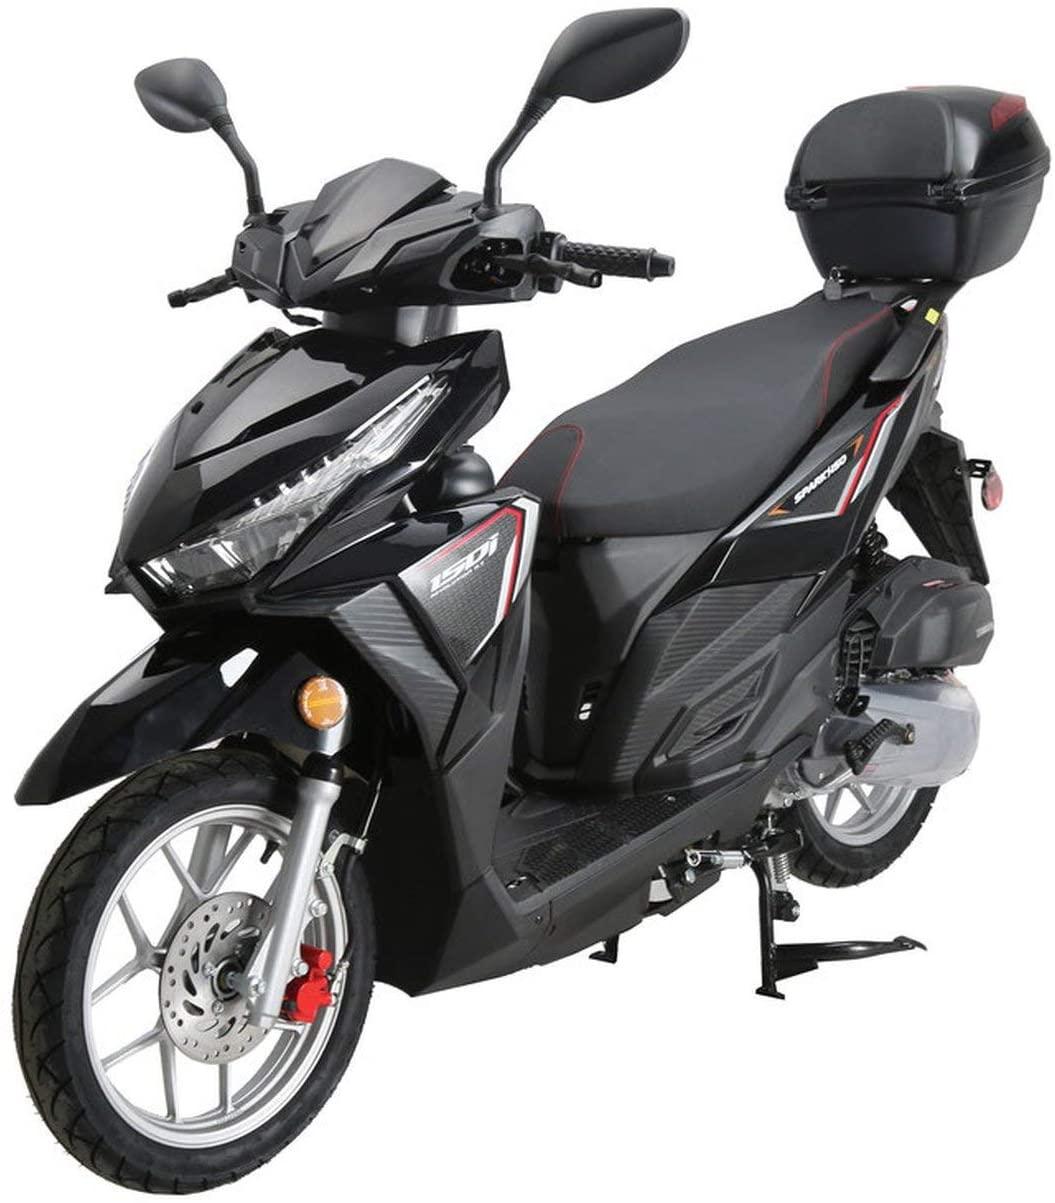 TAO SmartDealsNow Brings Brand 150cc Sports Bike